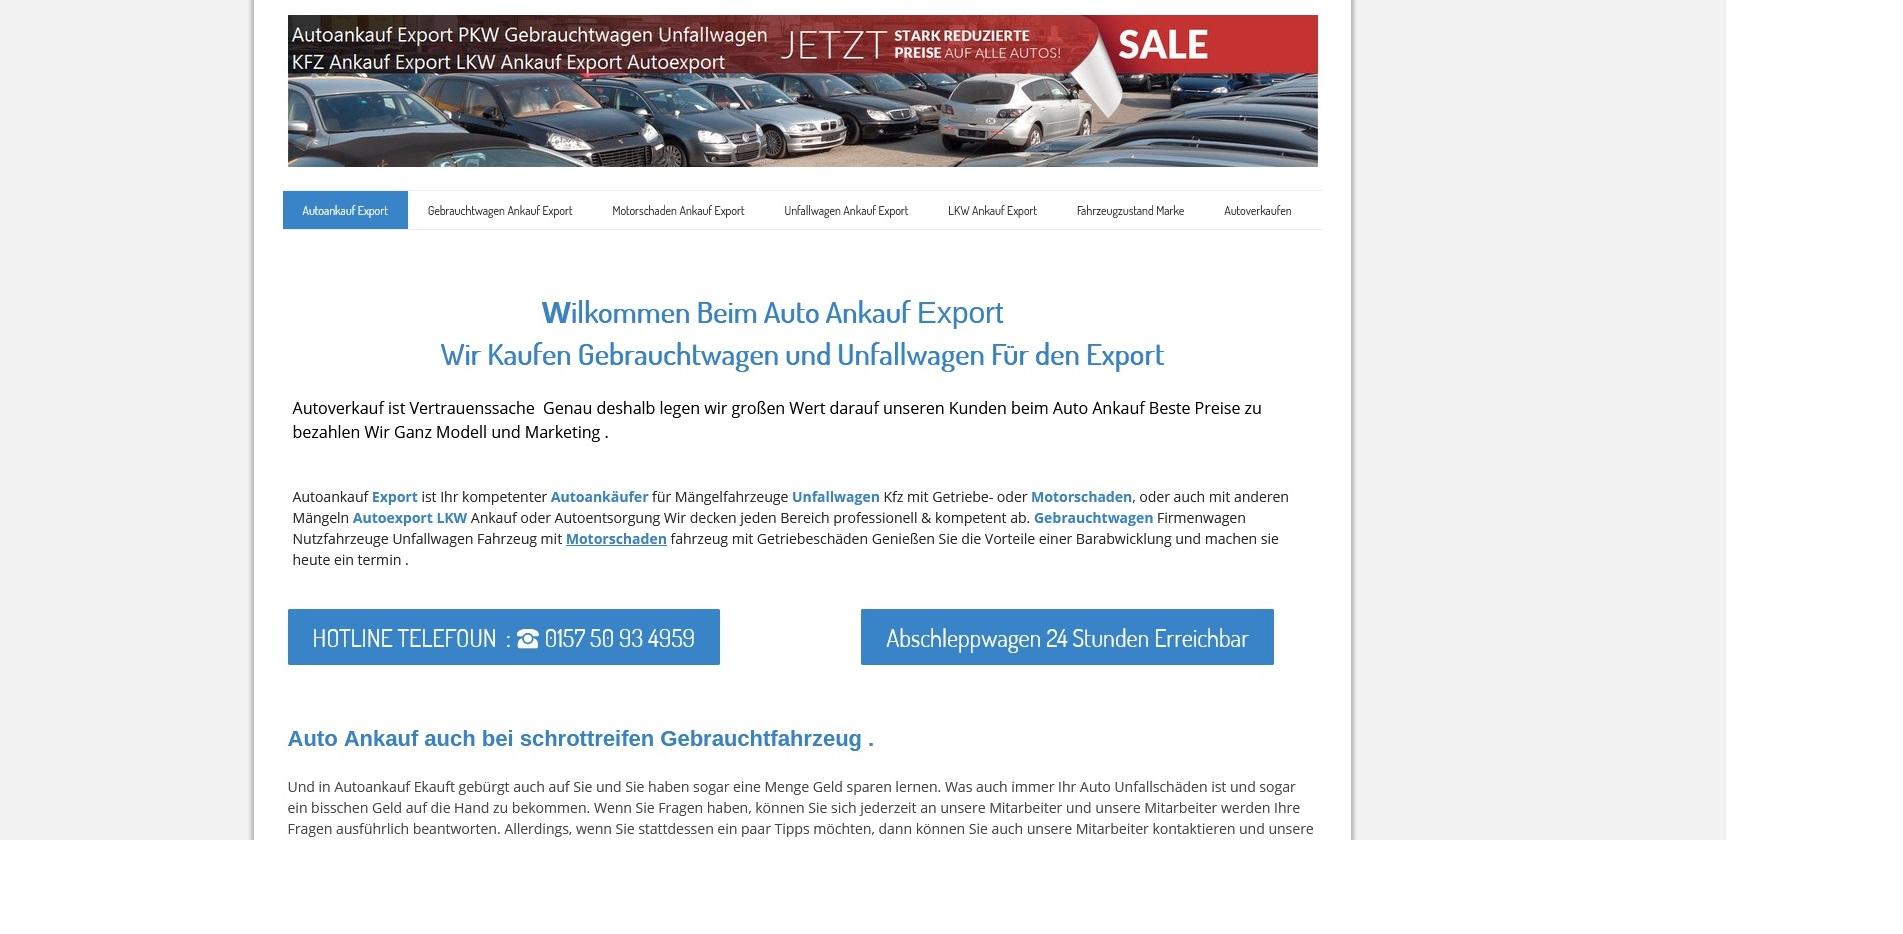 https://www.kfz-ankauf-export.de - Autoankauf Bad Kreuznach